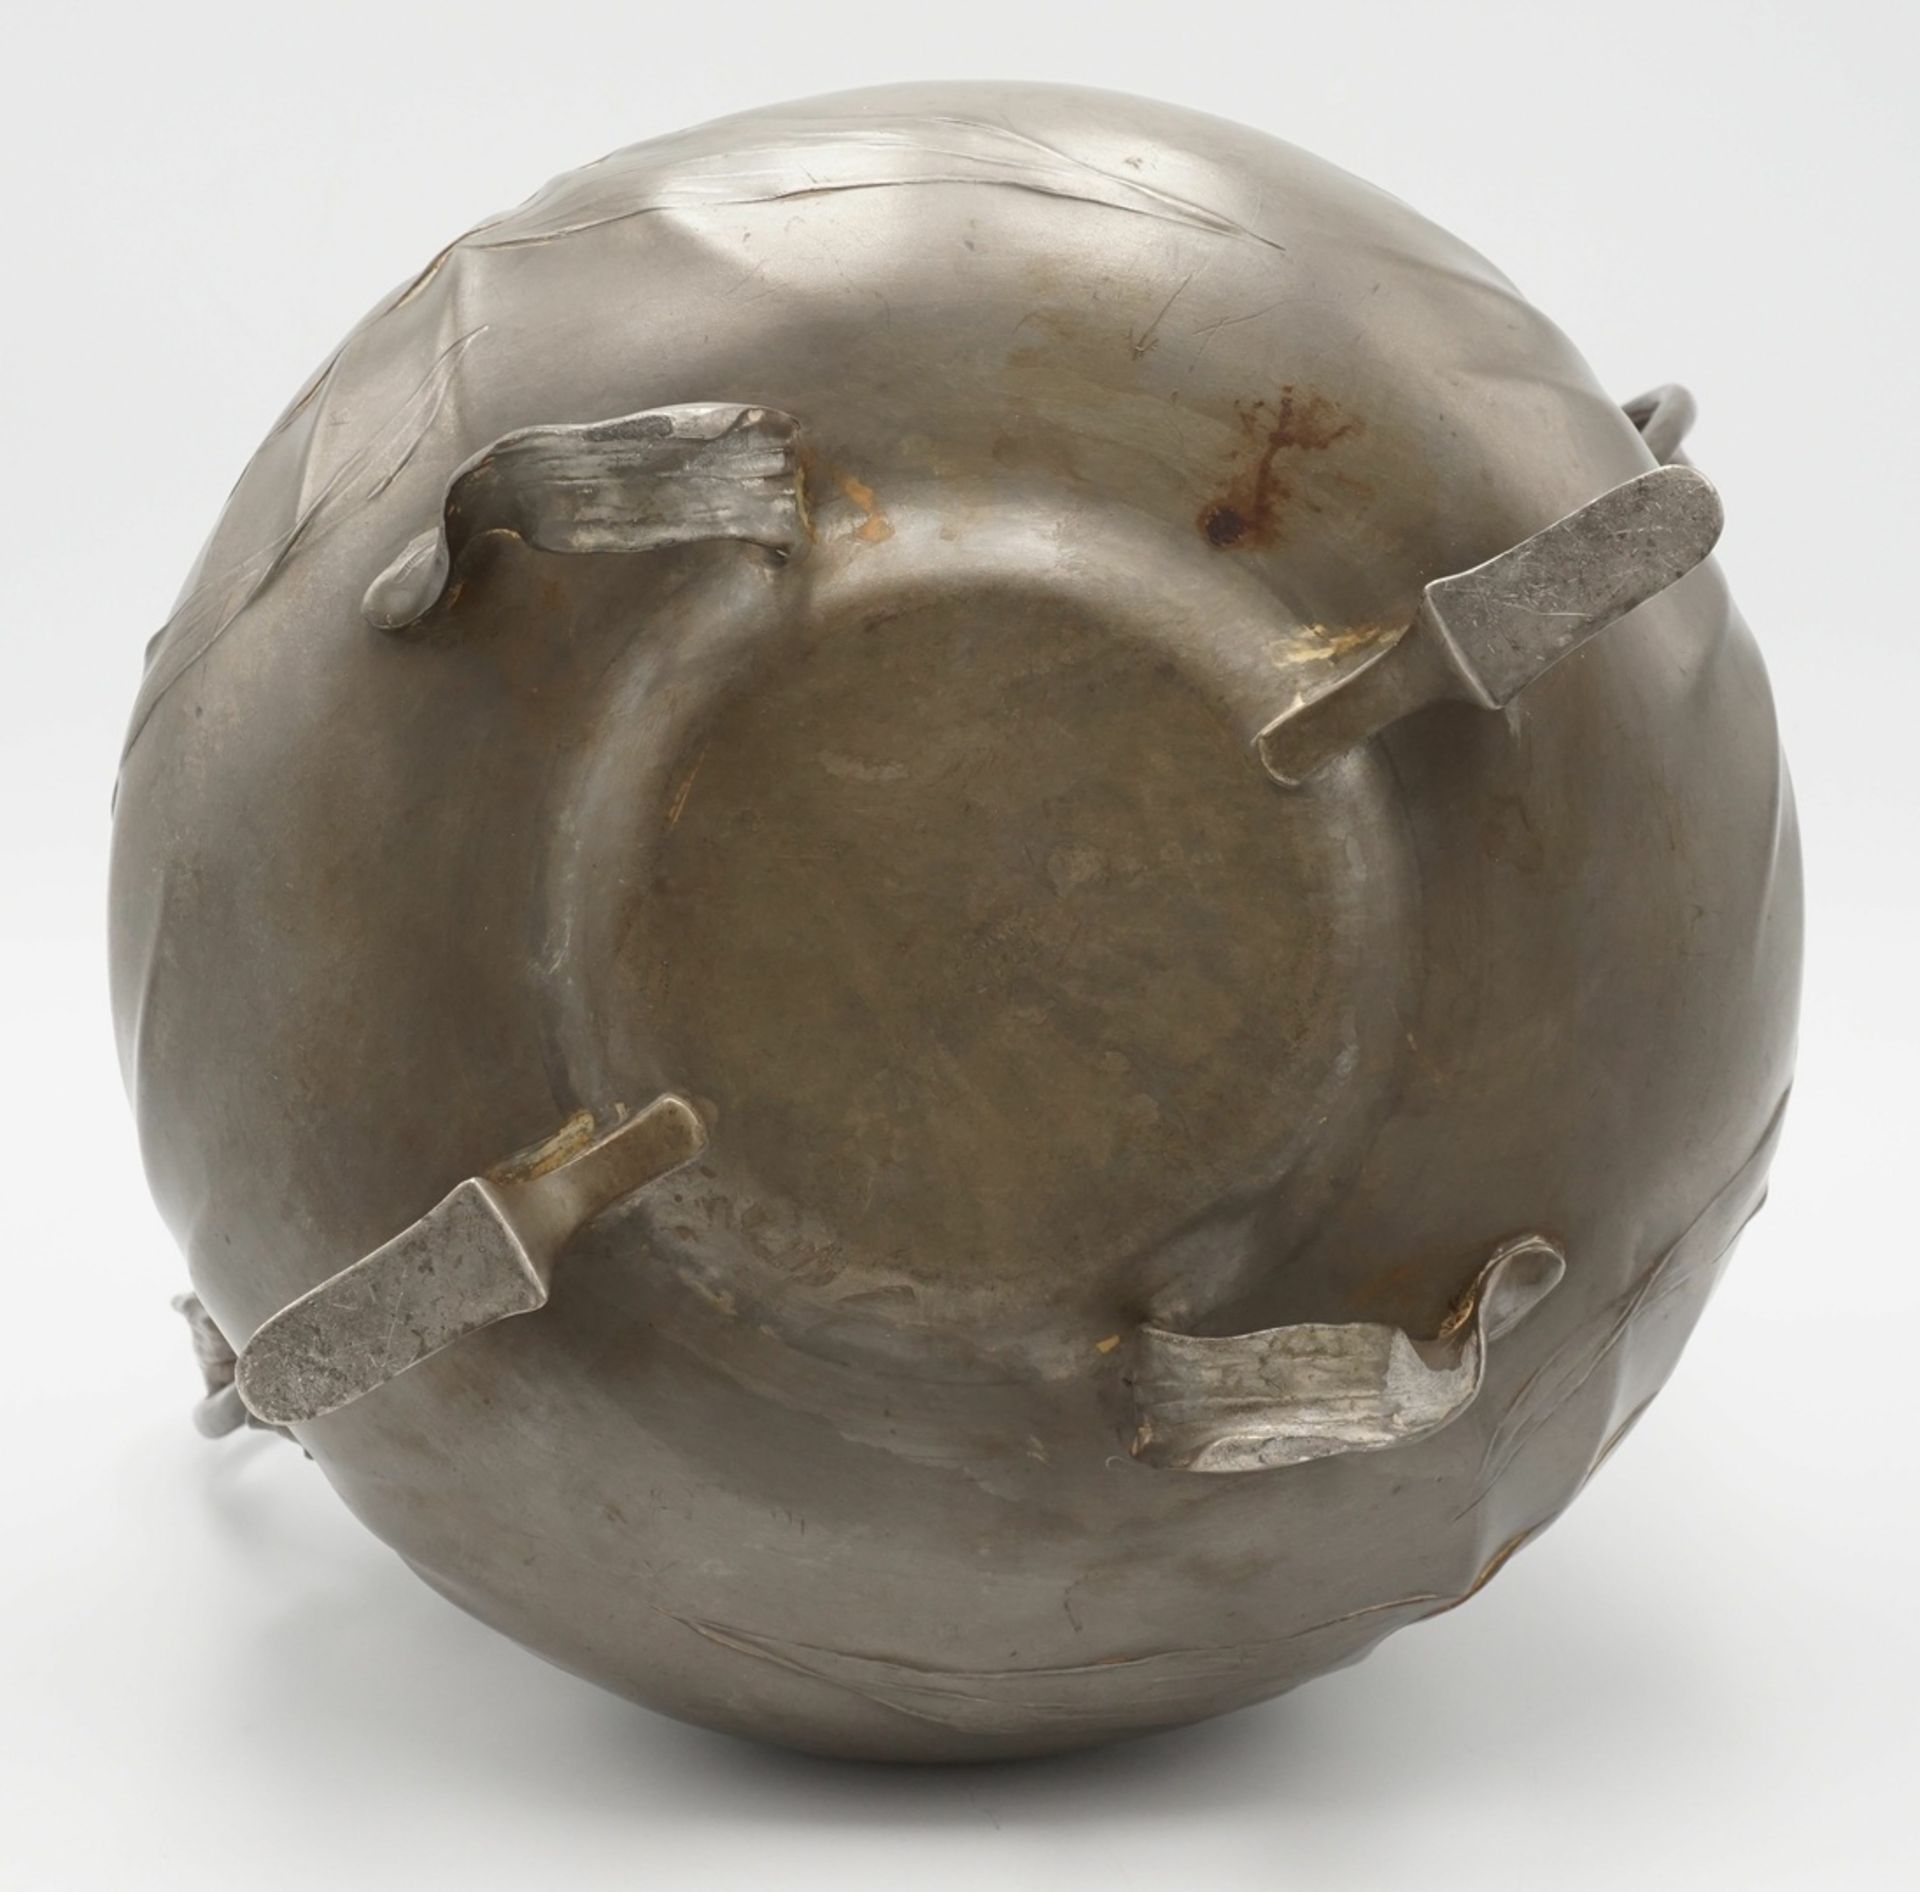 Orivit Bowle mit Deckel, 1889-1926 - Image 3 of 4